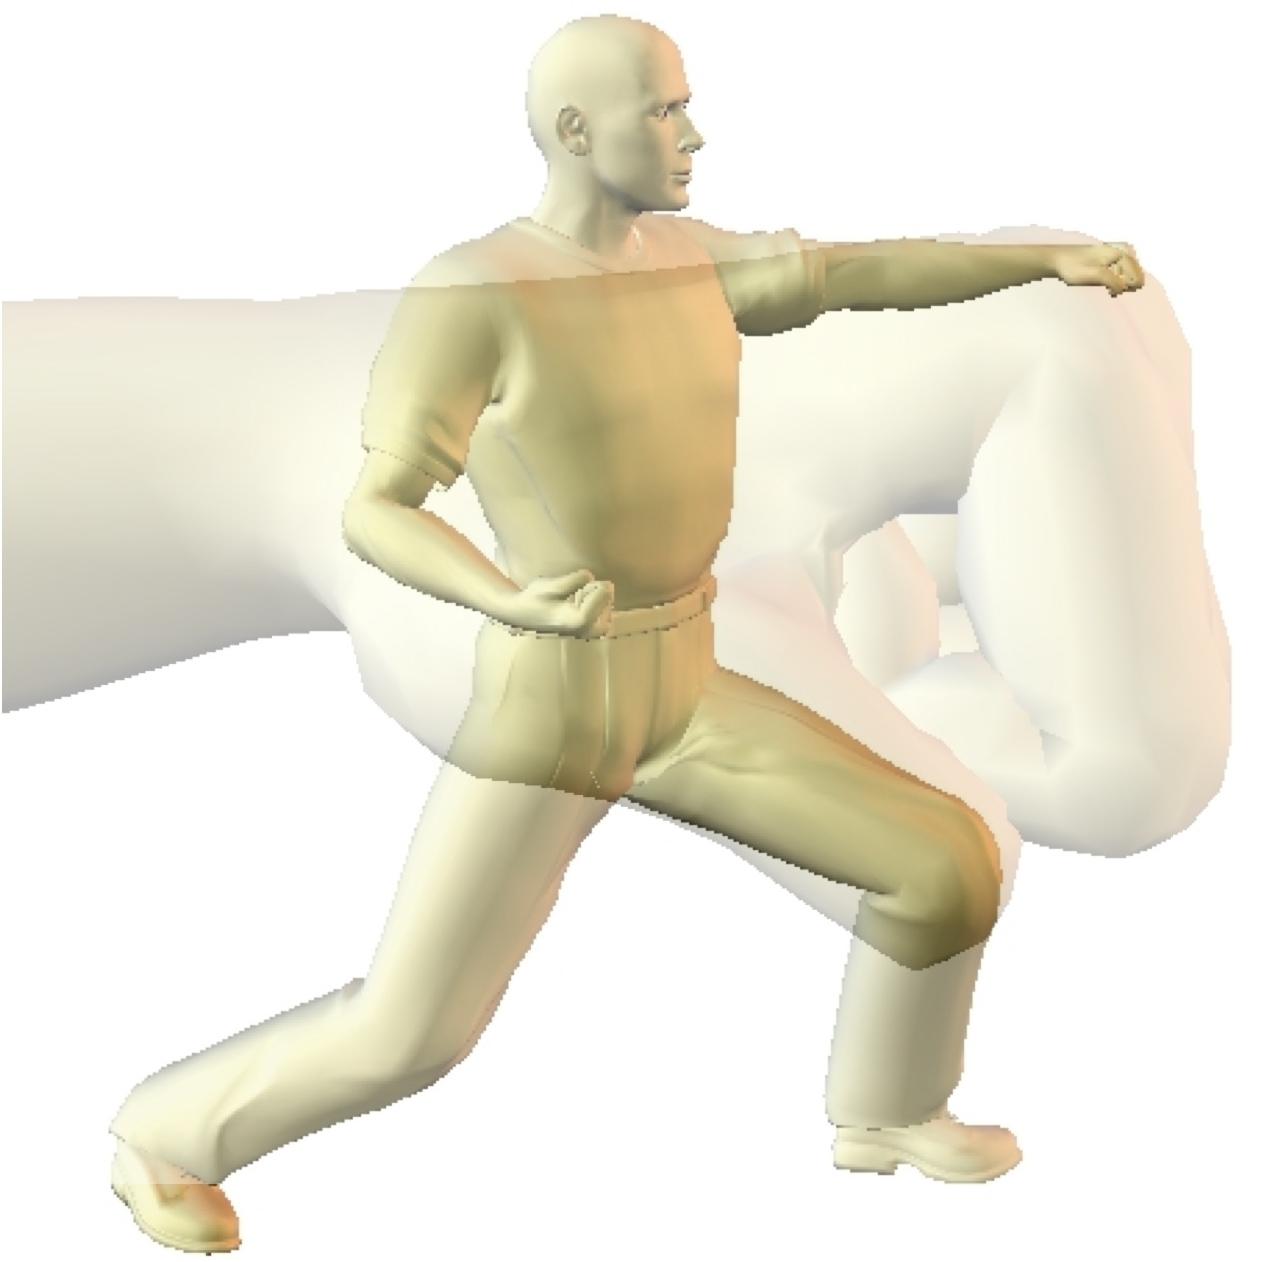 image Human punching bag for domina jade indica